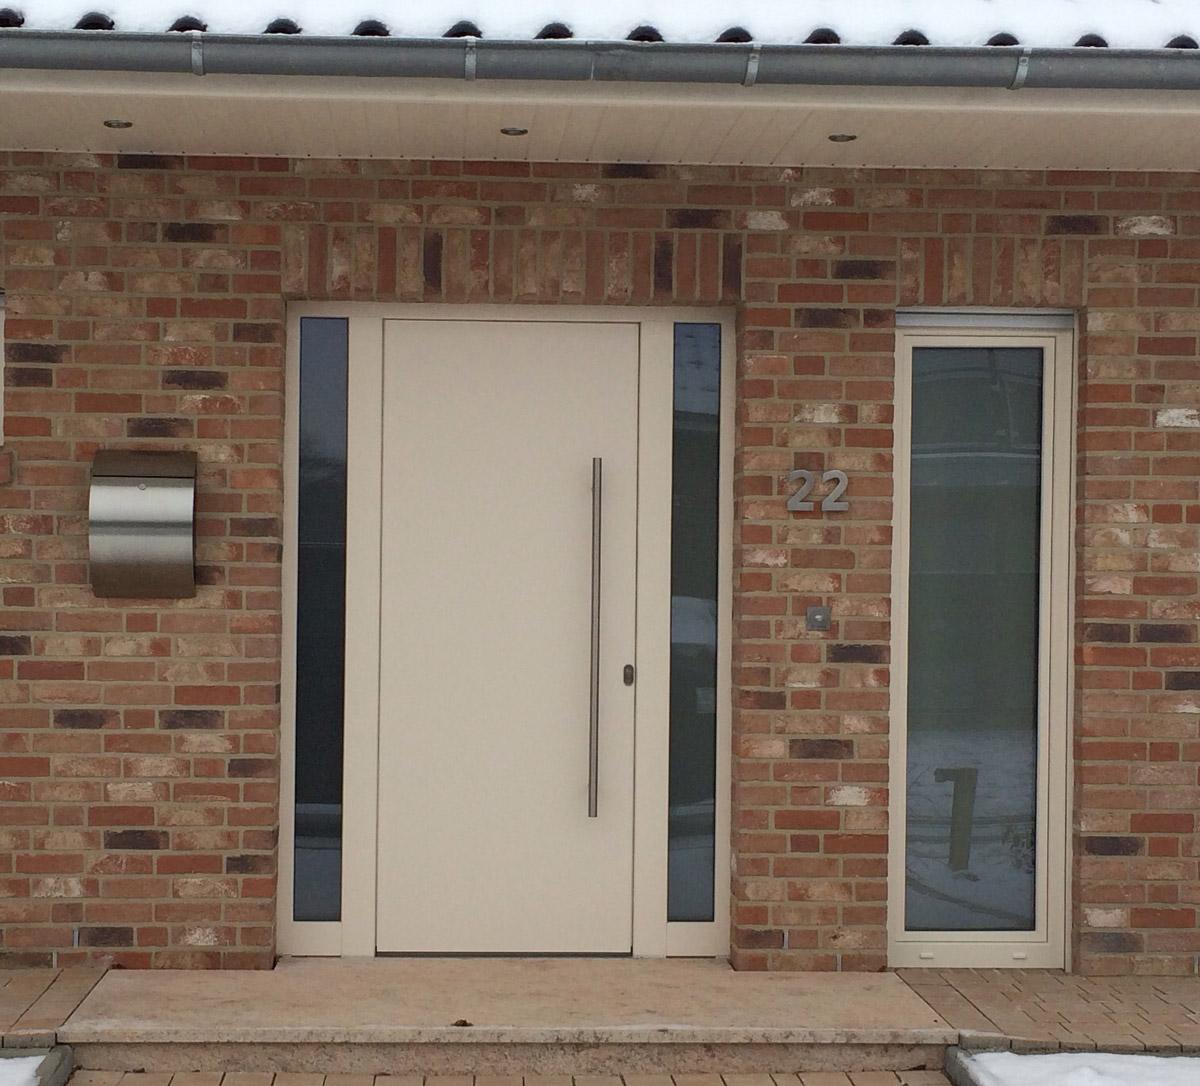 Weiße eingangstüren  Haustüren & Fenster - Fuchs Baugesellschaft mbH